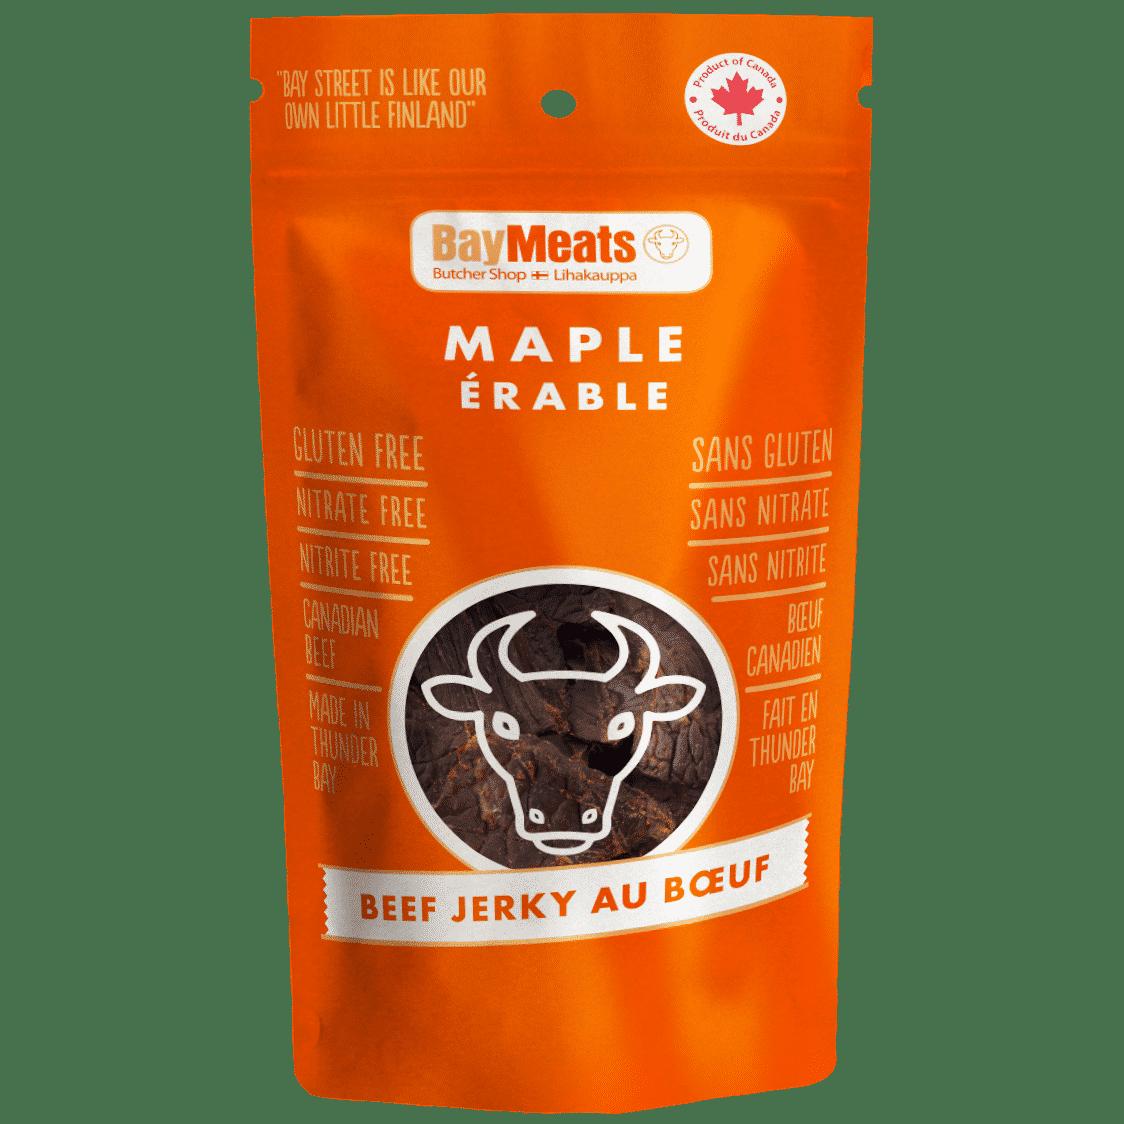 Maple - Orange Package